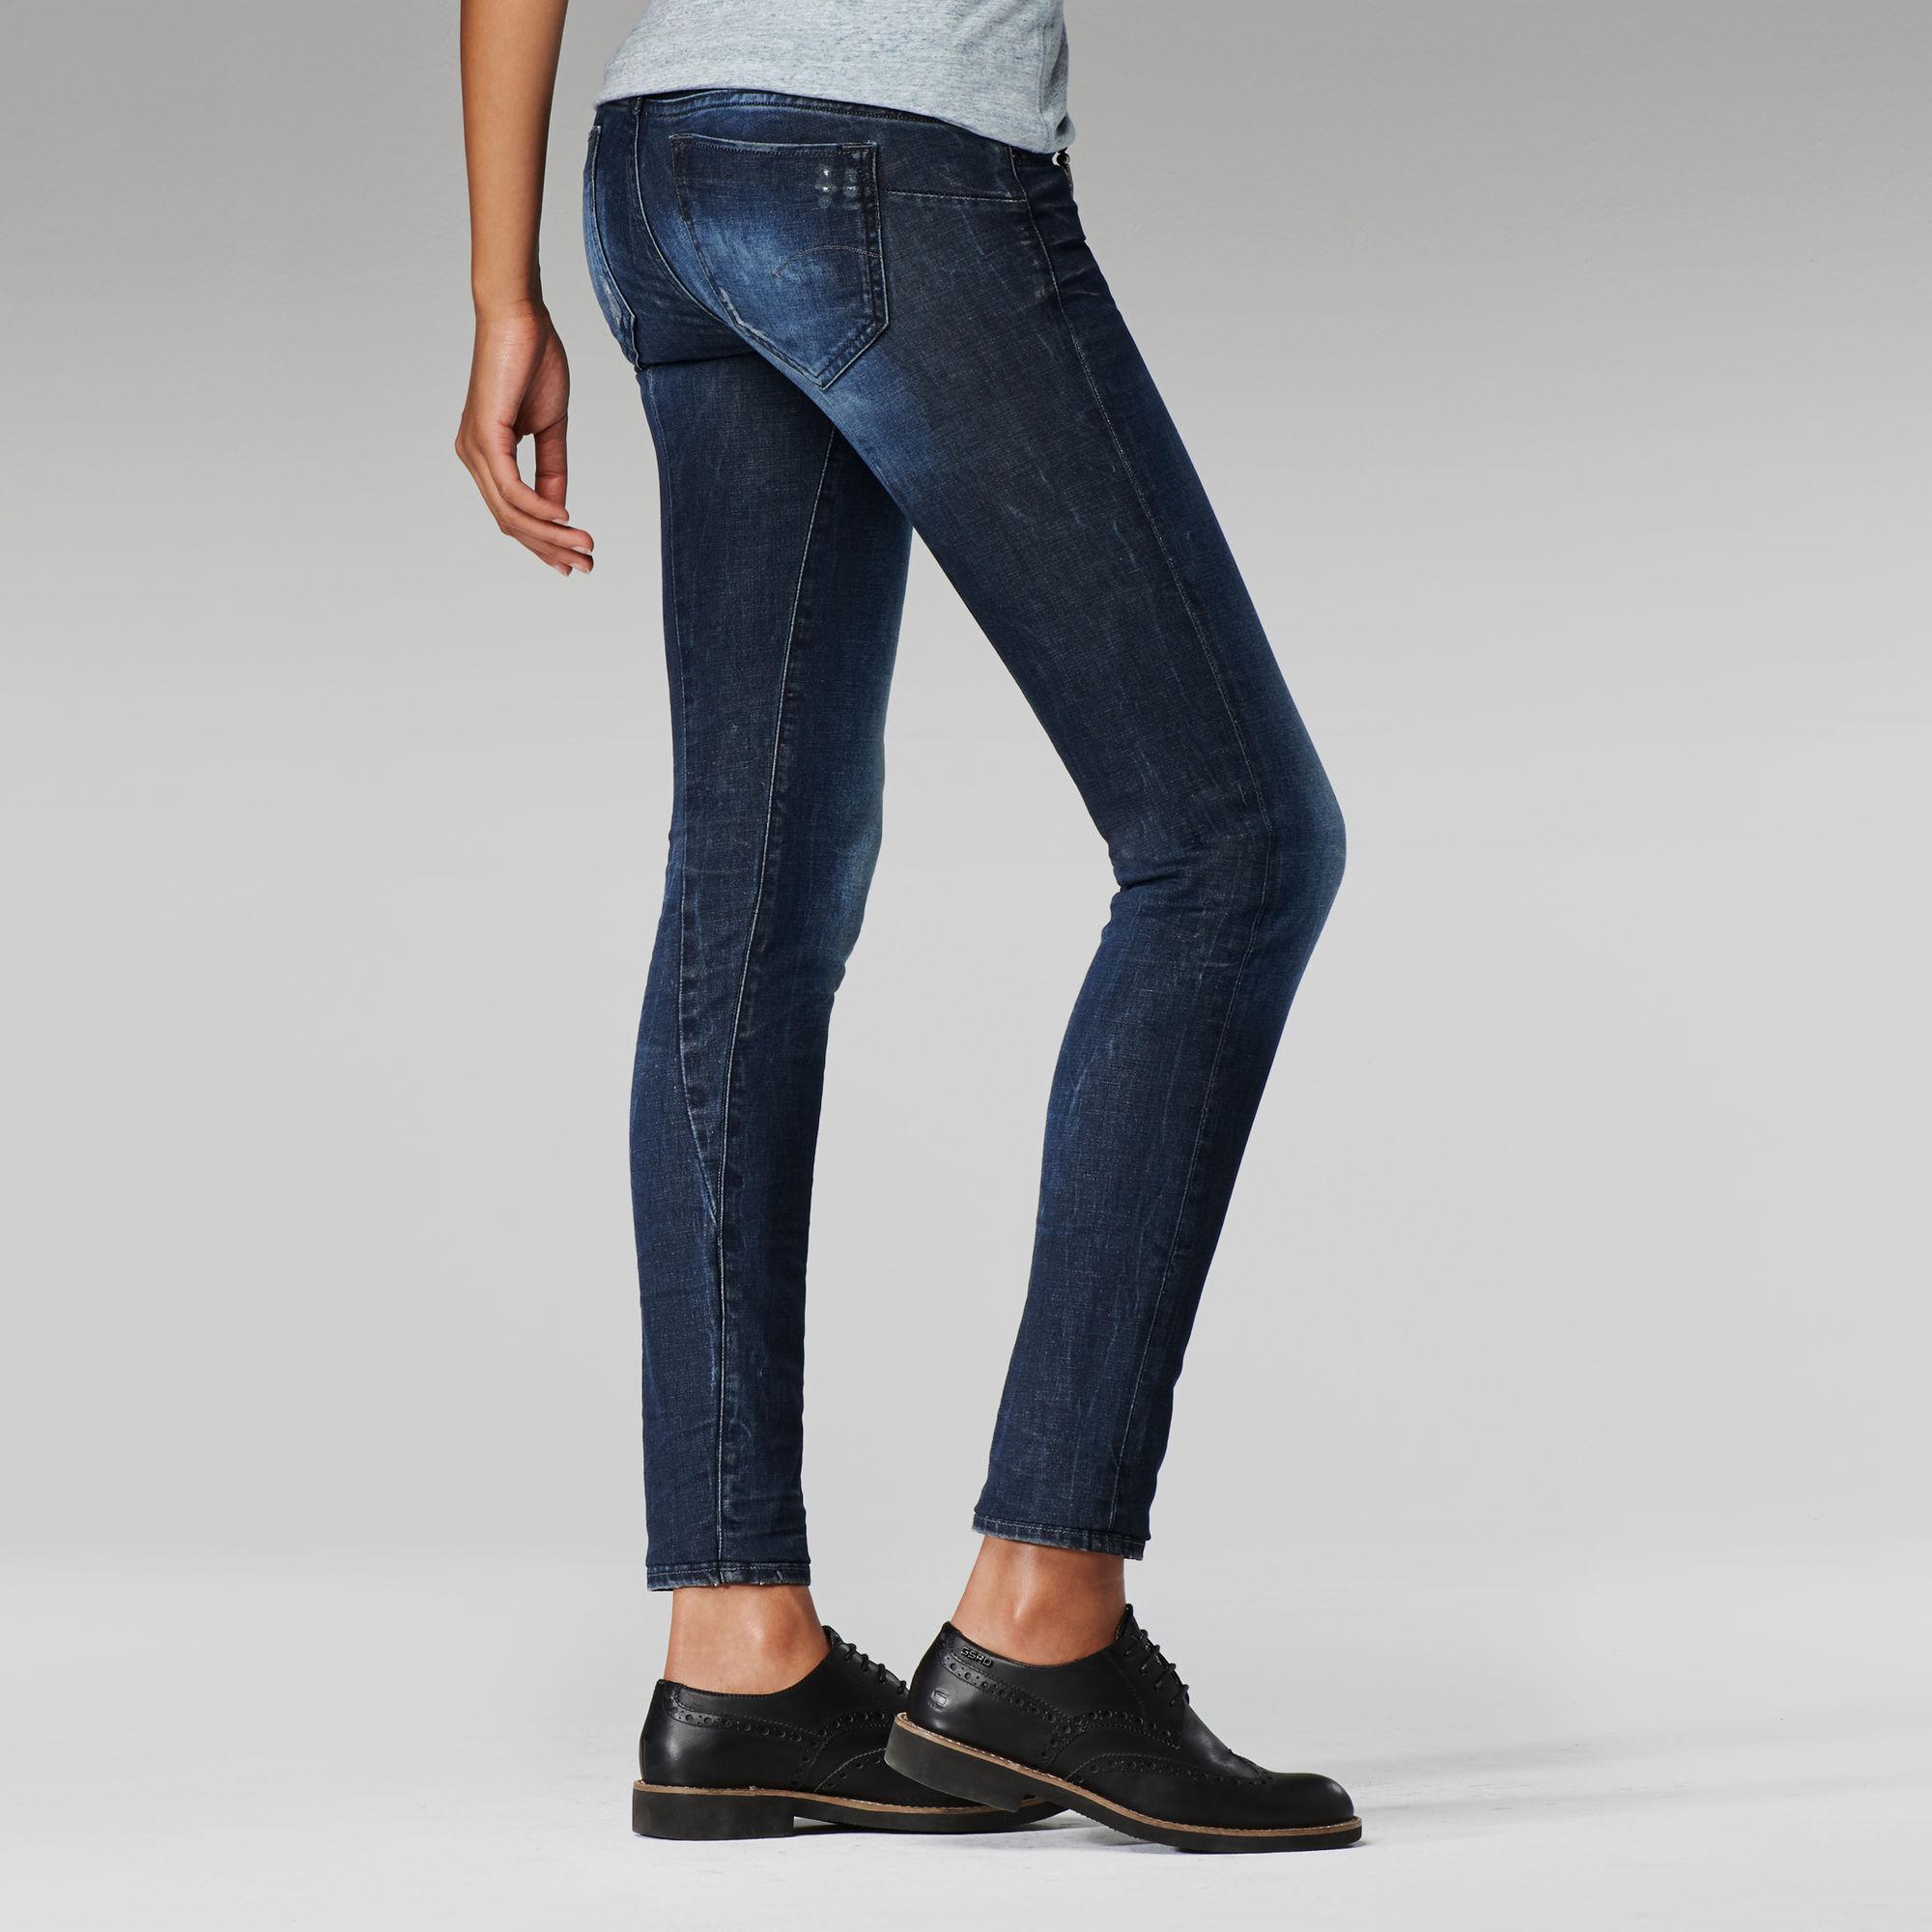 Midge Sculpted Low Waist Skinny Jeans